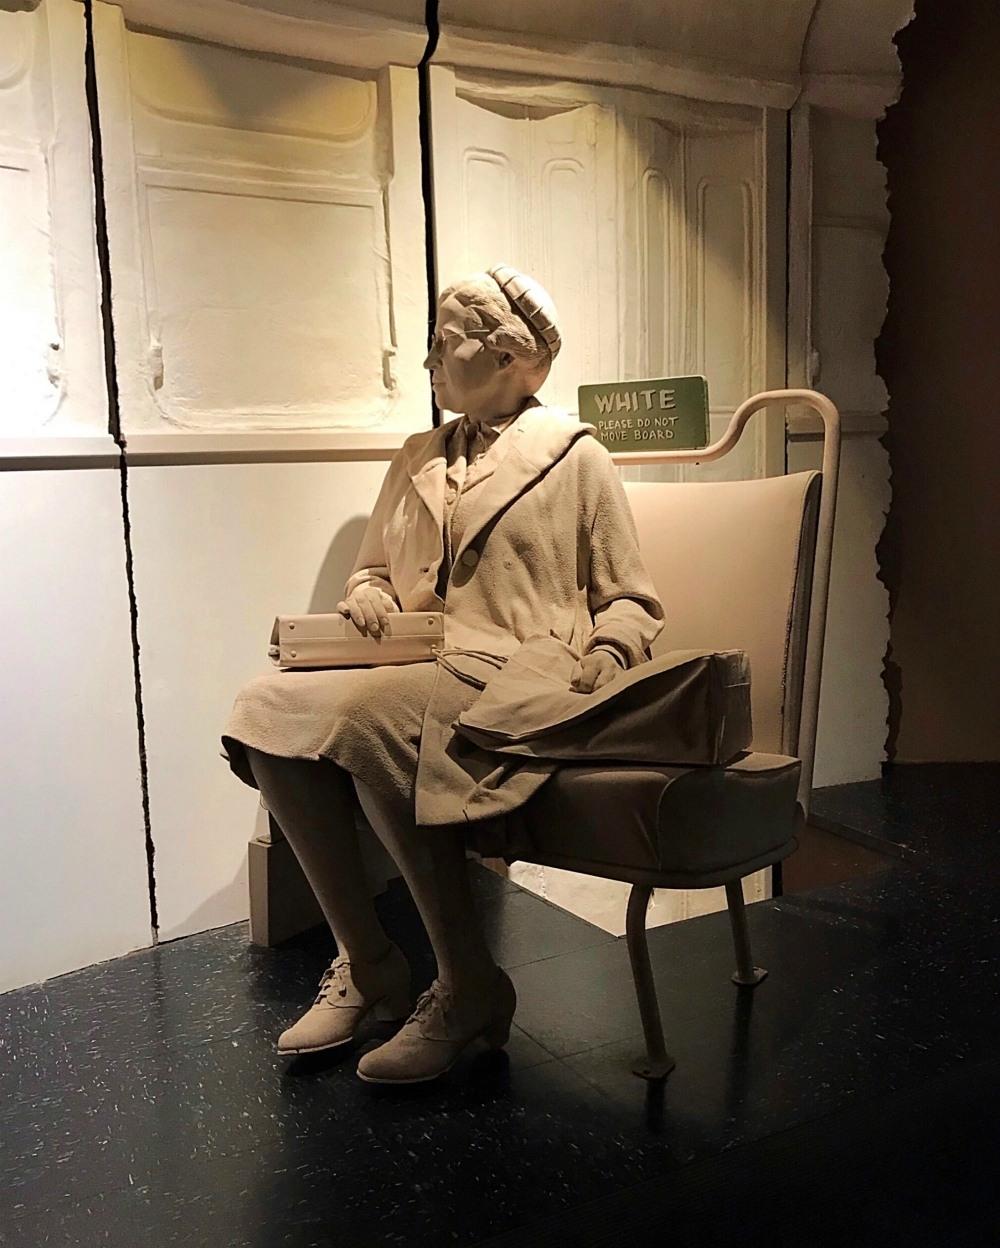 Rosa Parks statue at Birmingham Civil Rights Institute in Alabama Photo Heatheronhertravels.com